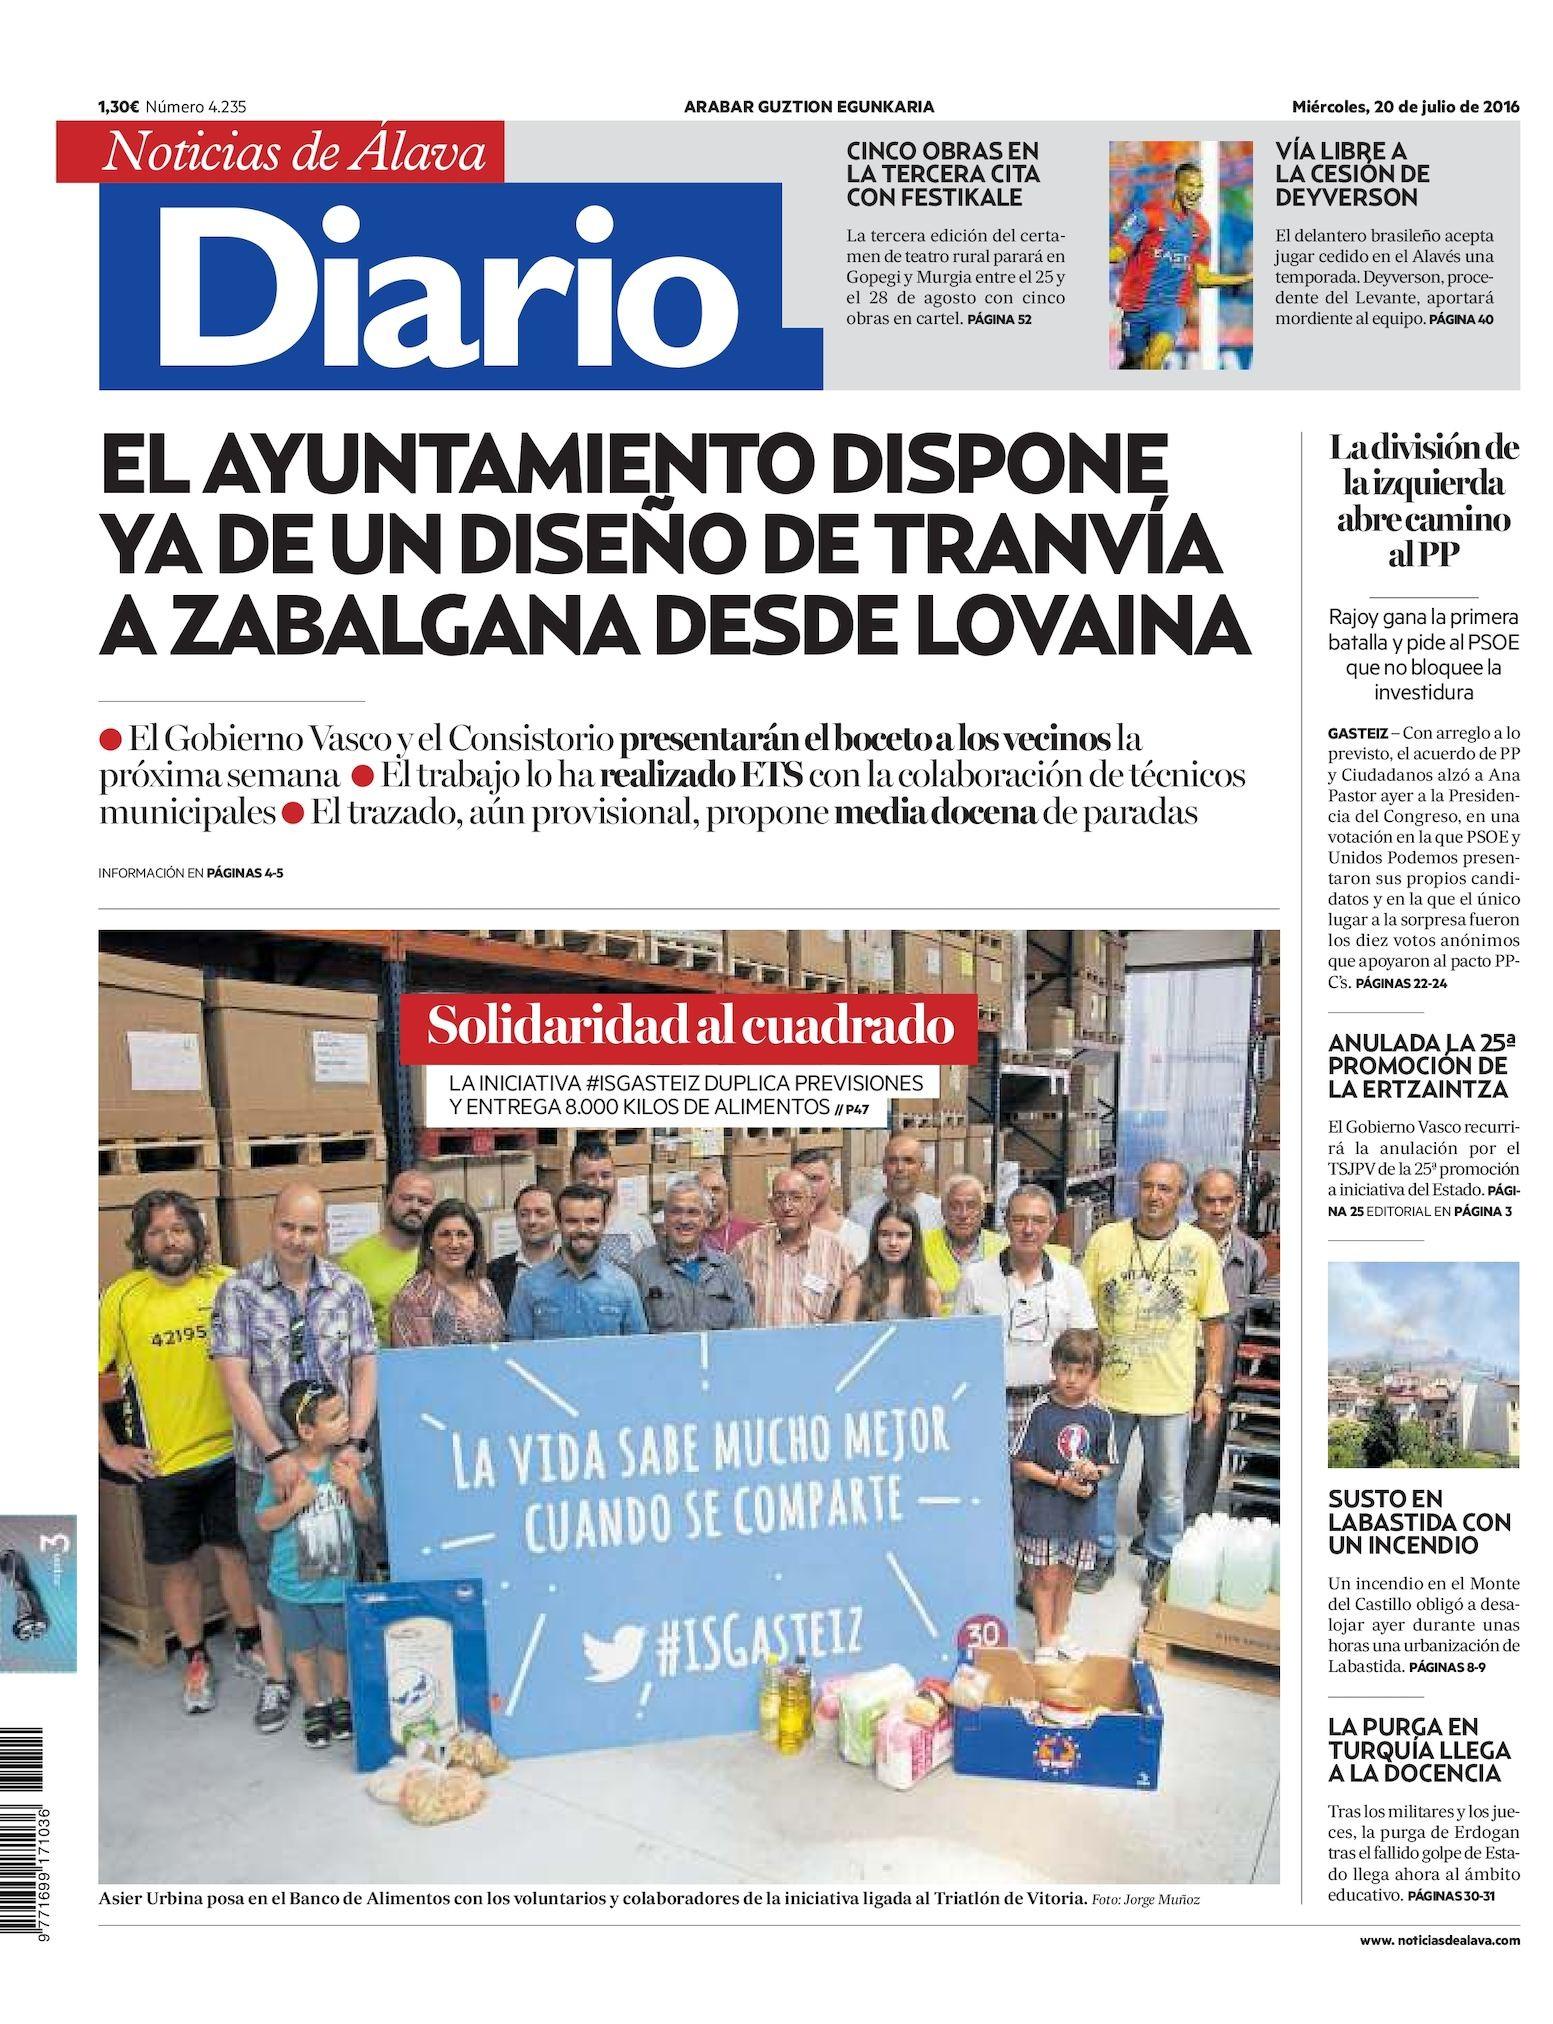 Calendario Laboral Alava 2019 Botha Más Actual Calaméo Diario De Noticias De lava